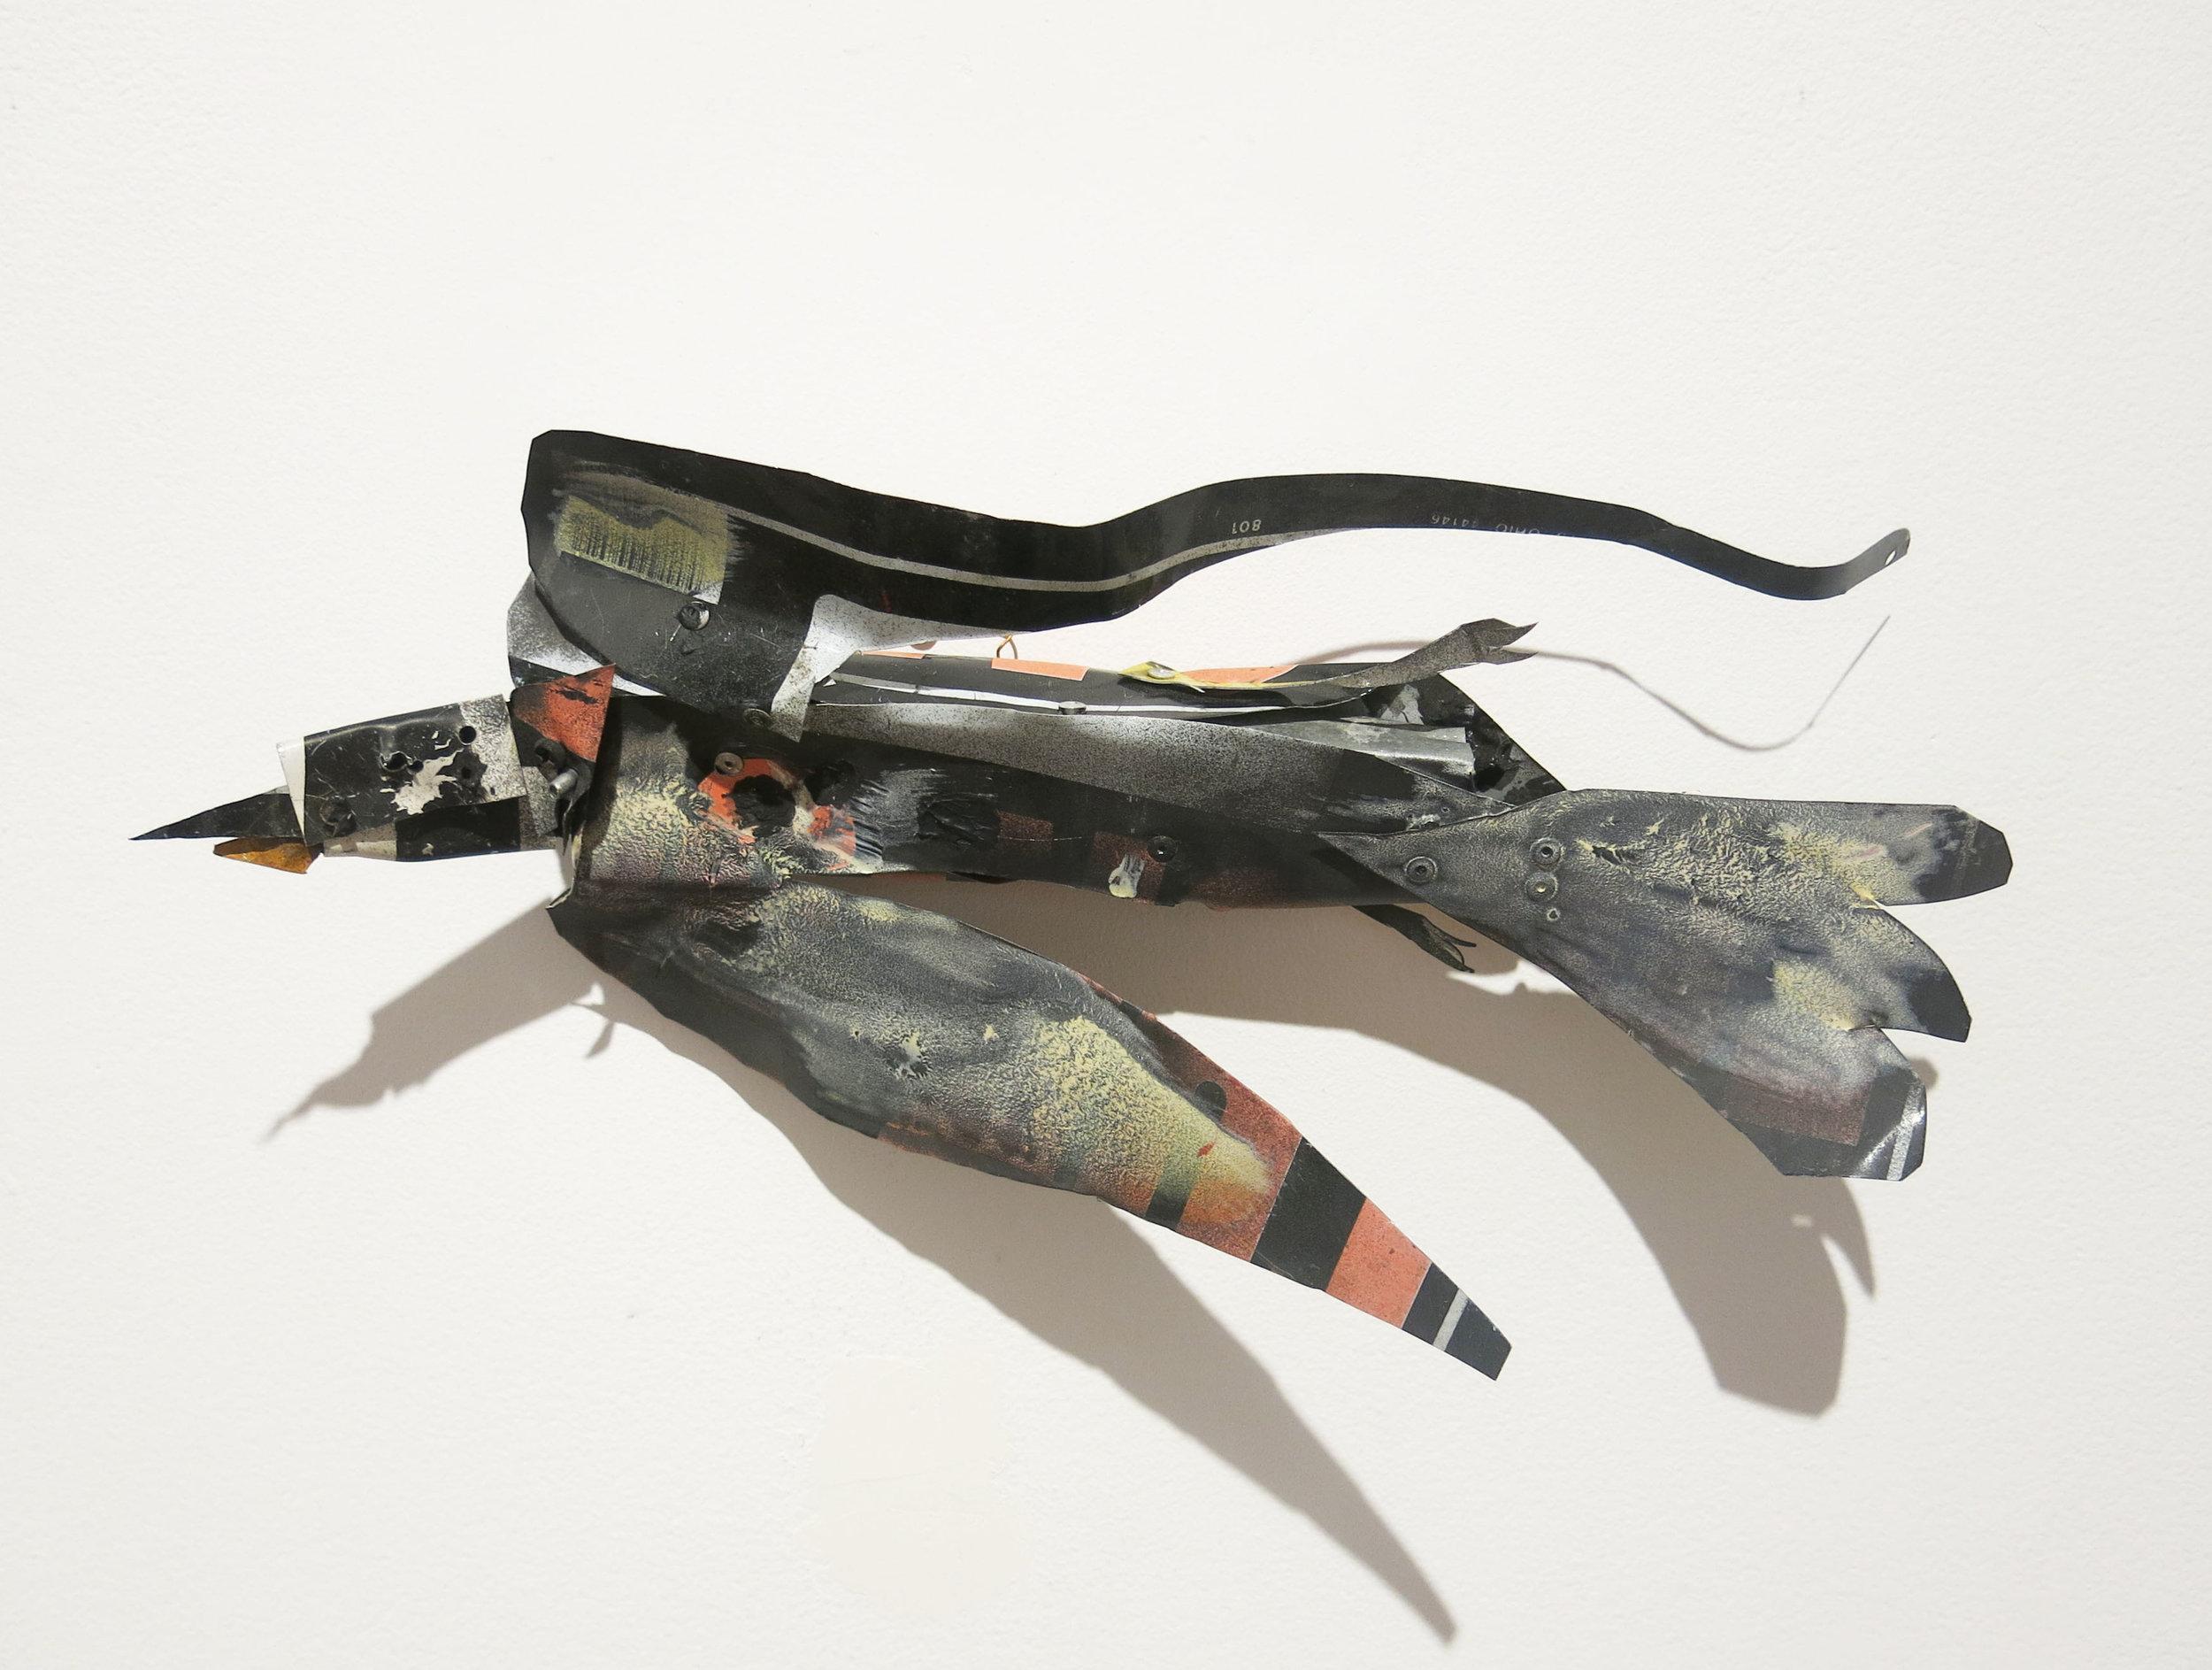 Matt Blackwell,  Bird,  2015, sheet metal, rivets, paint, 8h x 16w x 4d in.